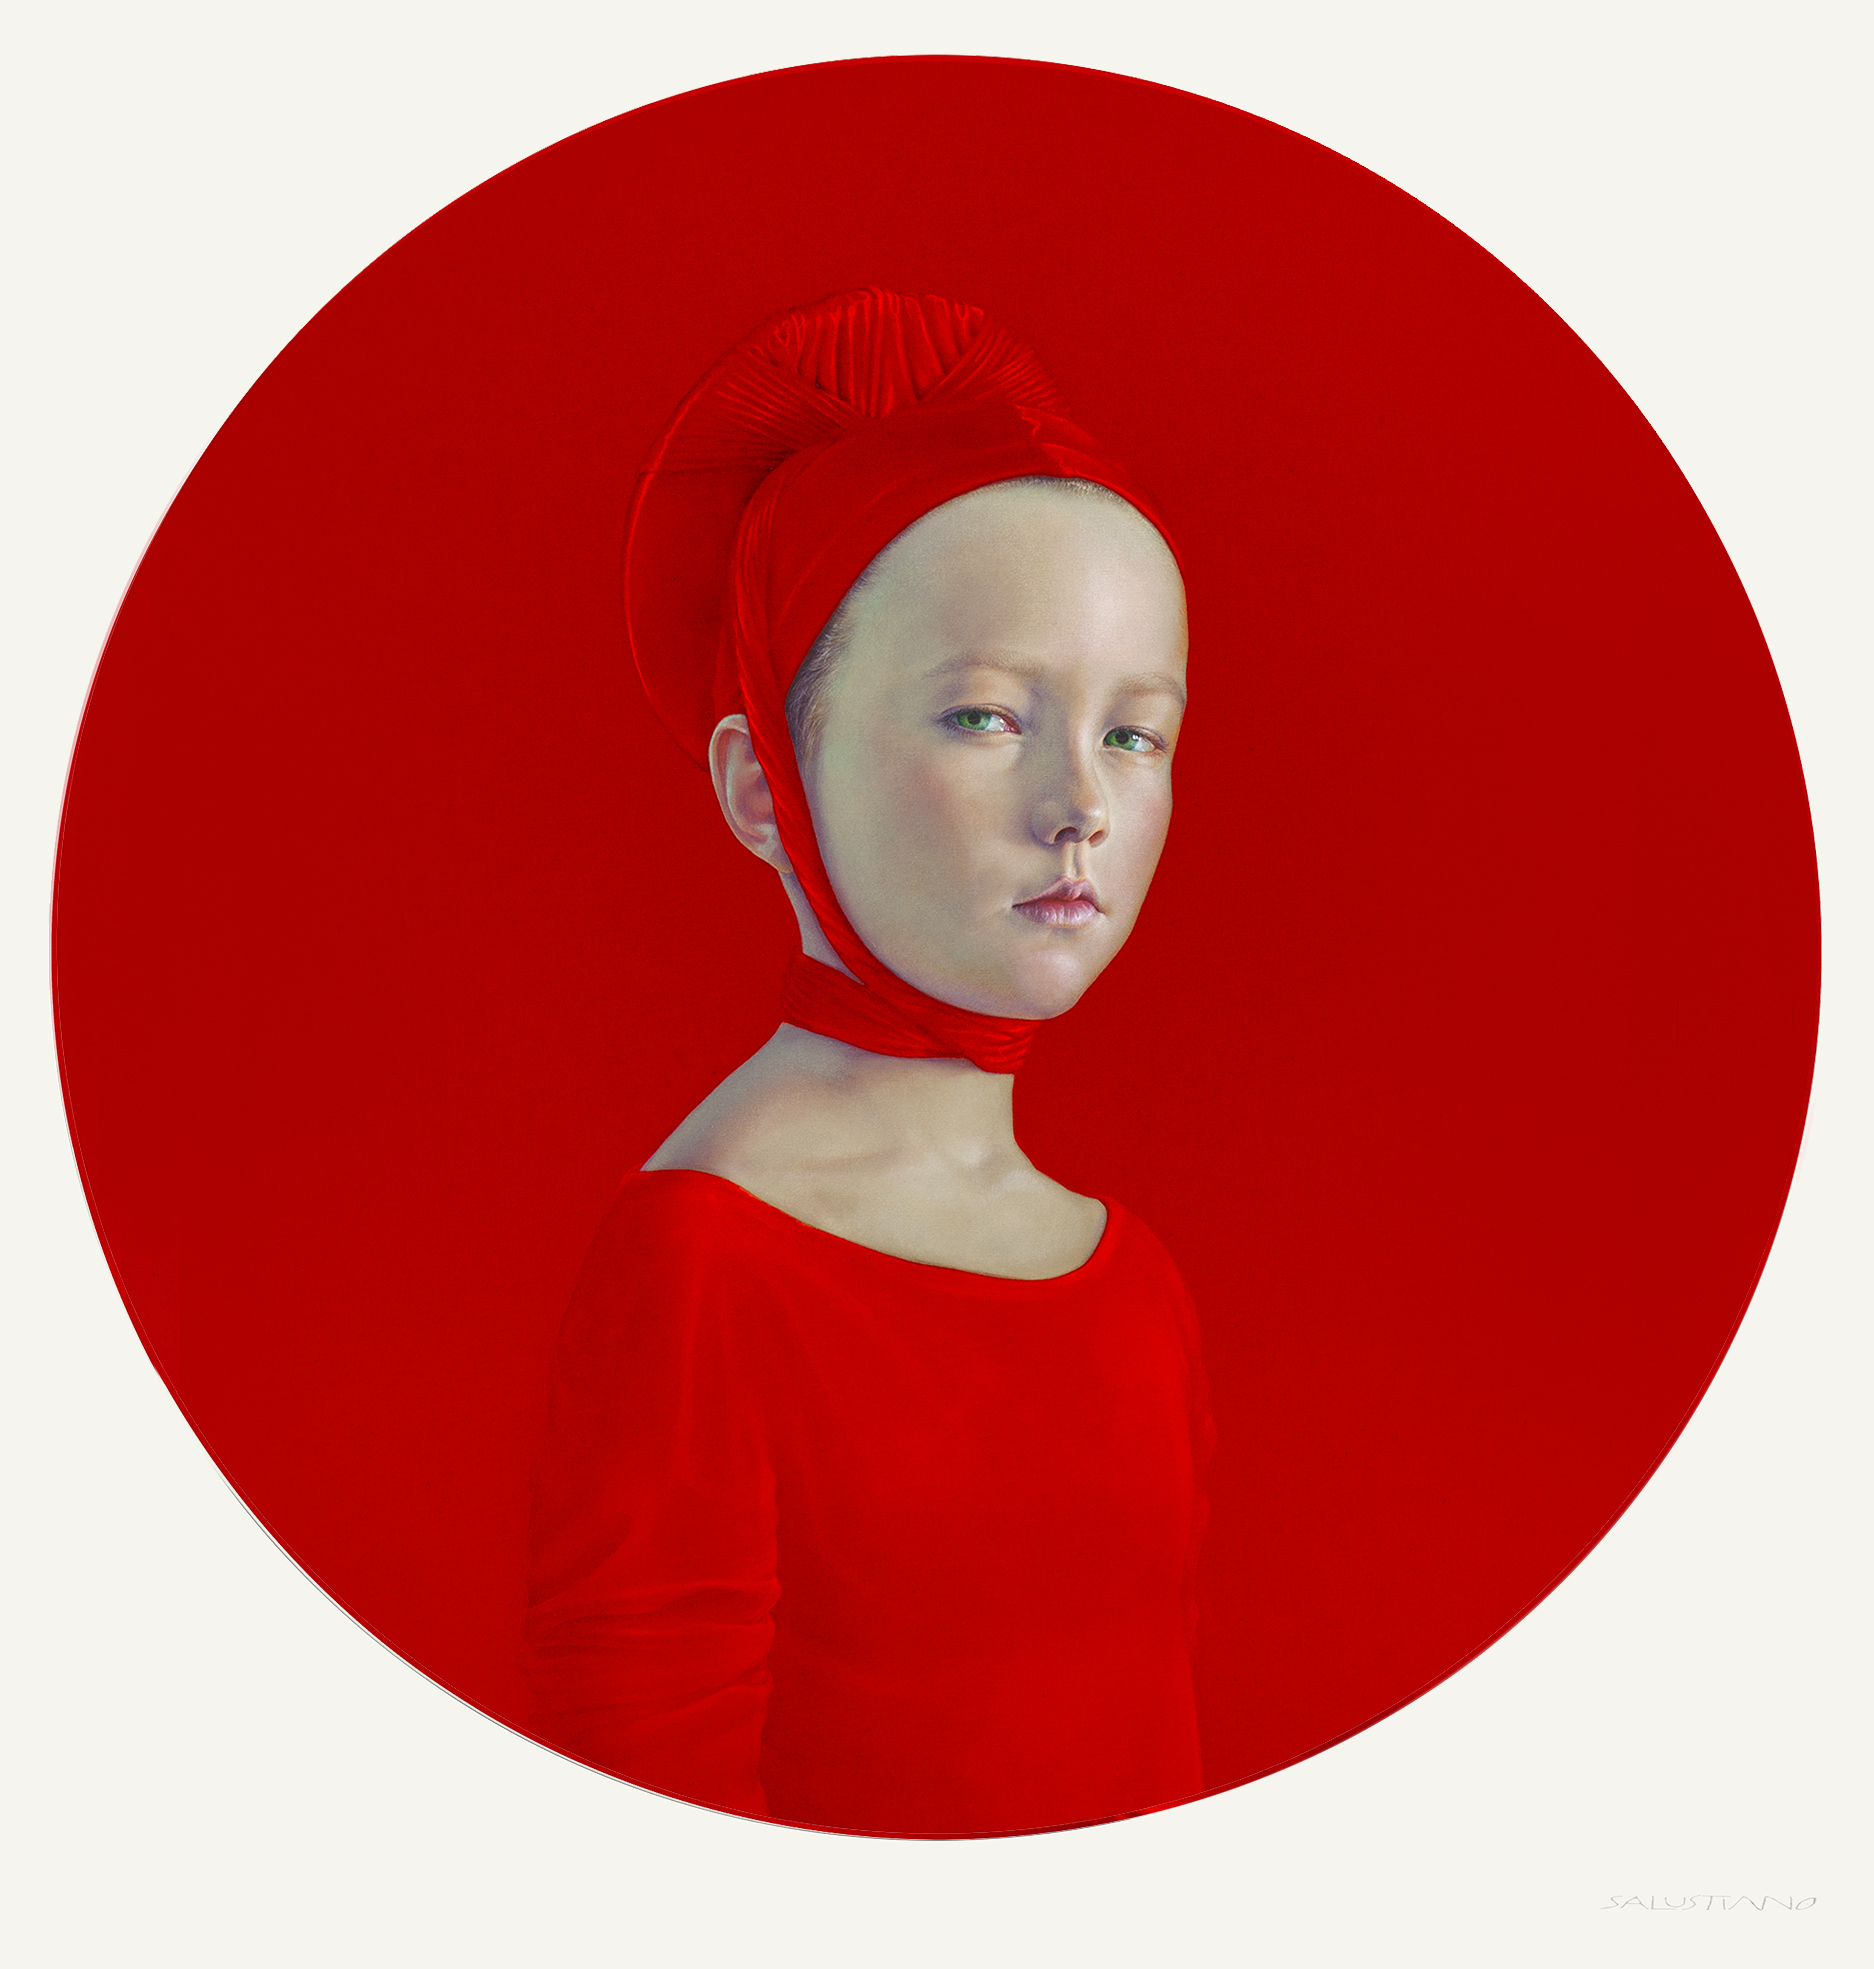 SALUSTIANO_Present Pluscuamperfect No.1_Pigment Print_82x78cm_ed.85_2016_350만원